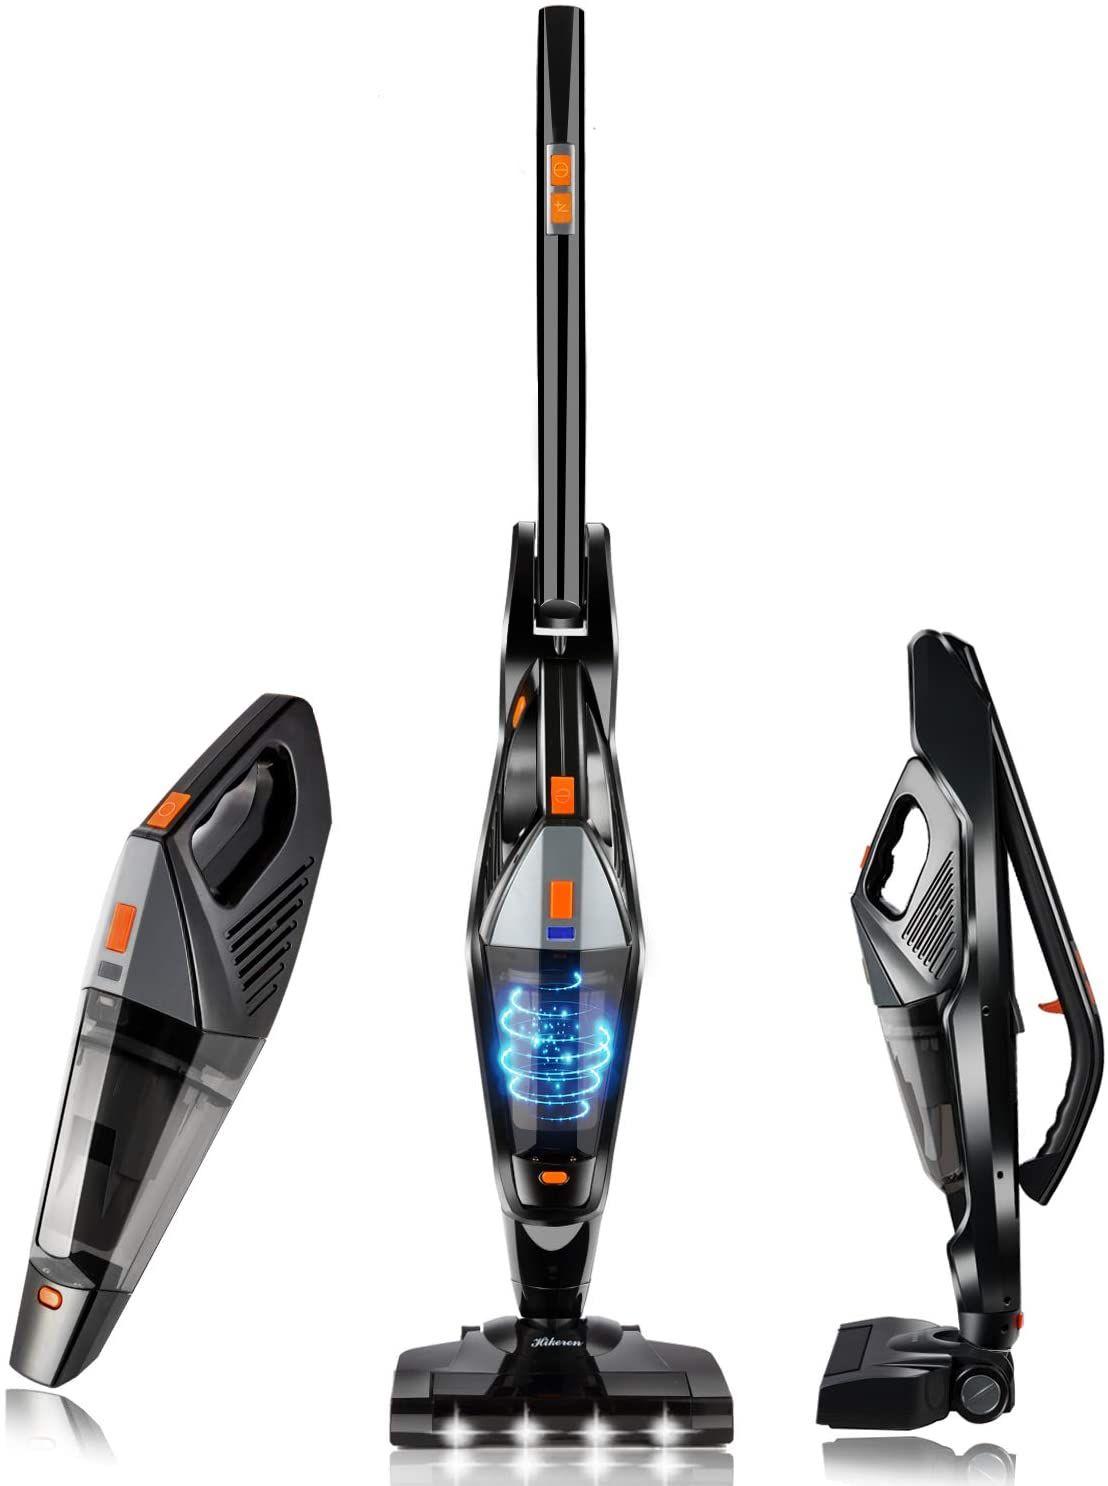 The Best Cheap Vacuums That Get The Job Done Under 100 Handheld Vacuum Vacuum Cleaner Cordless Vacuum